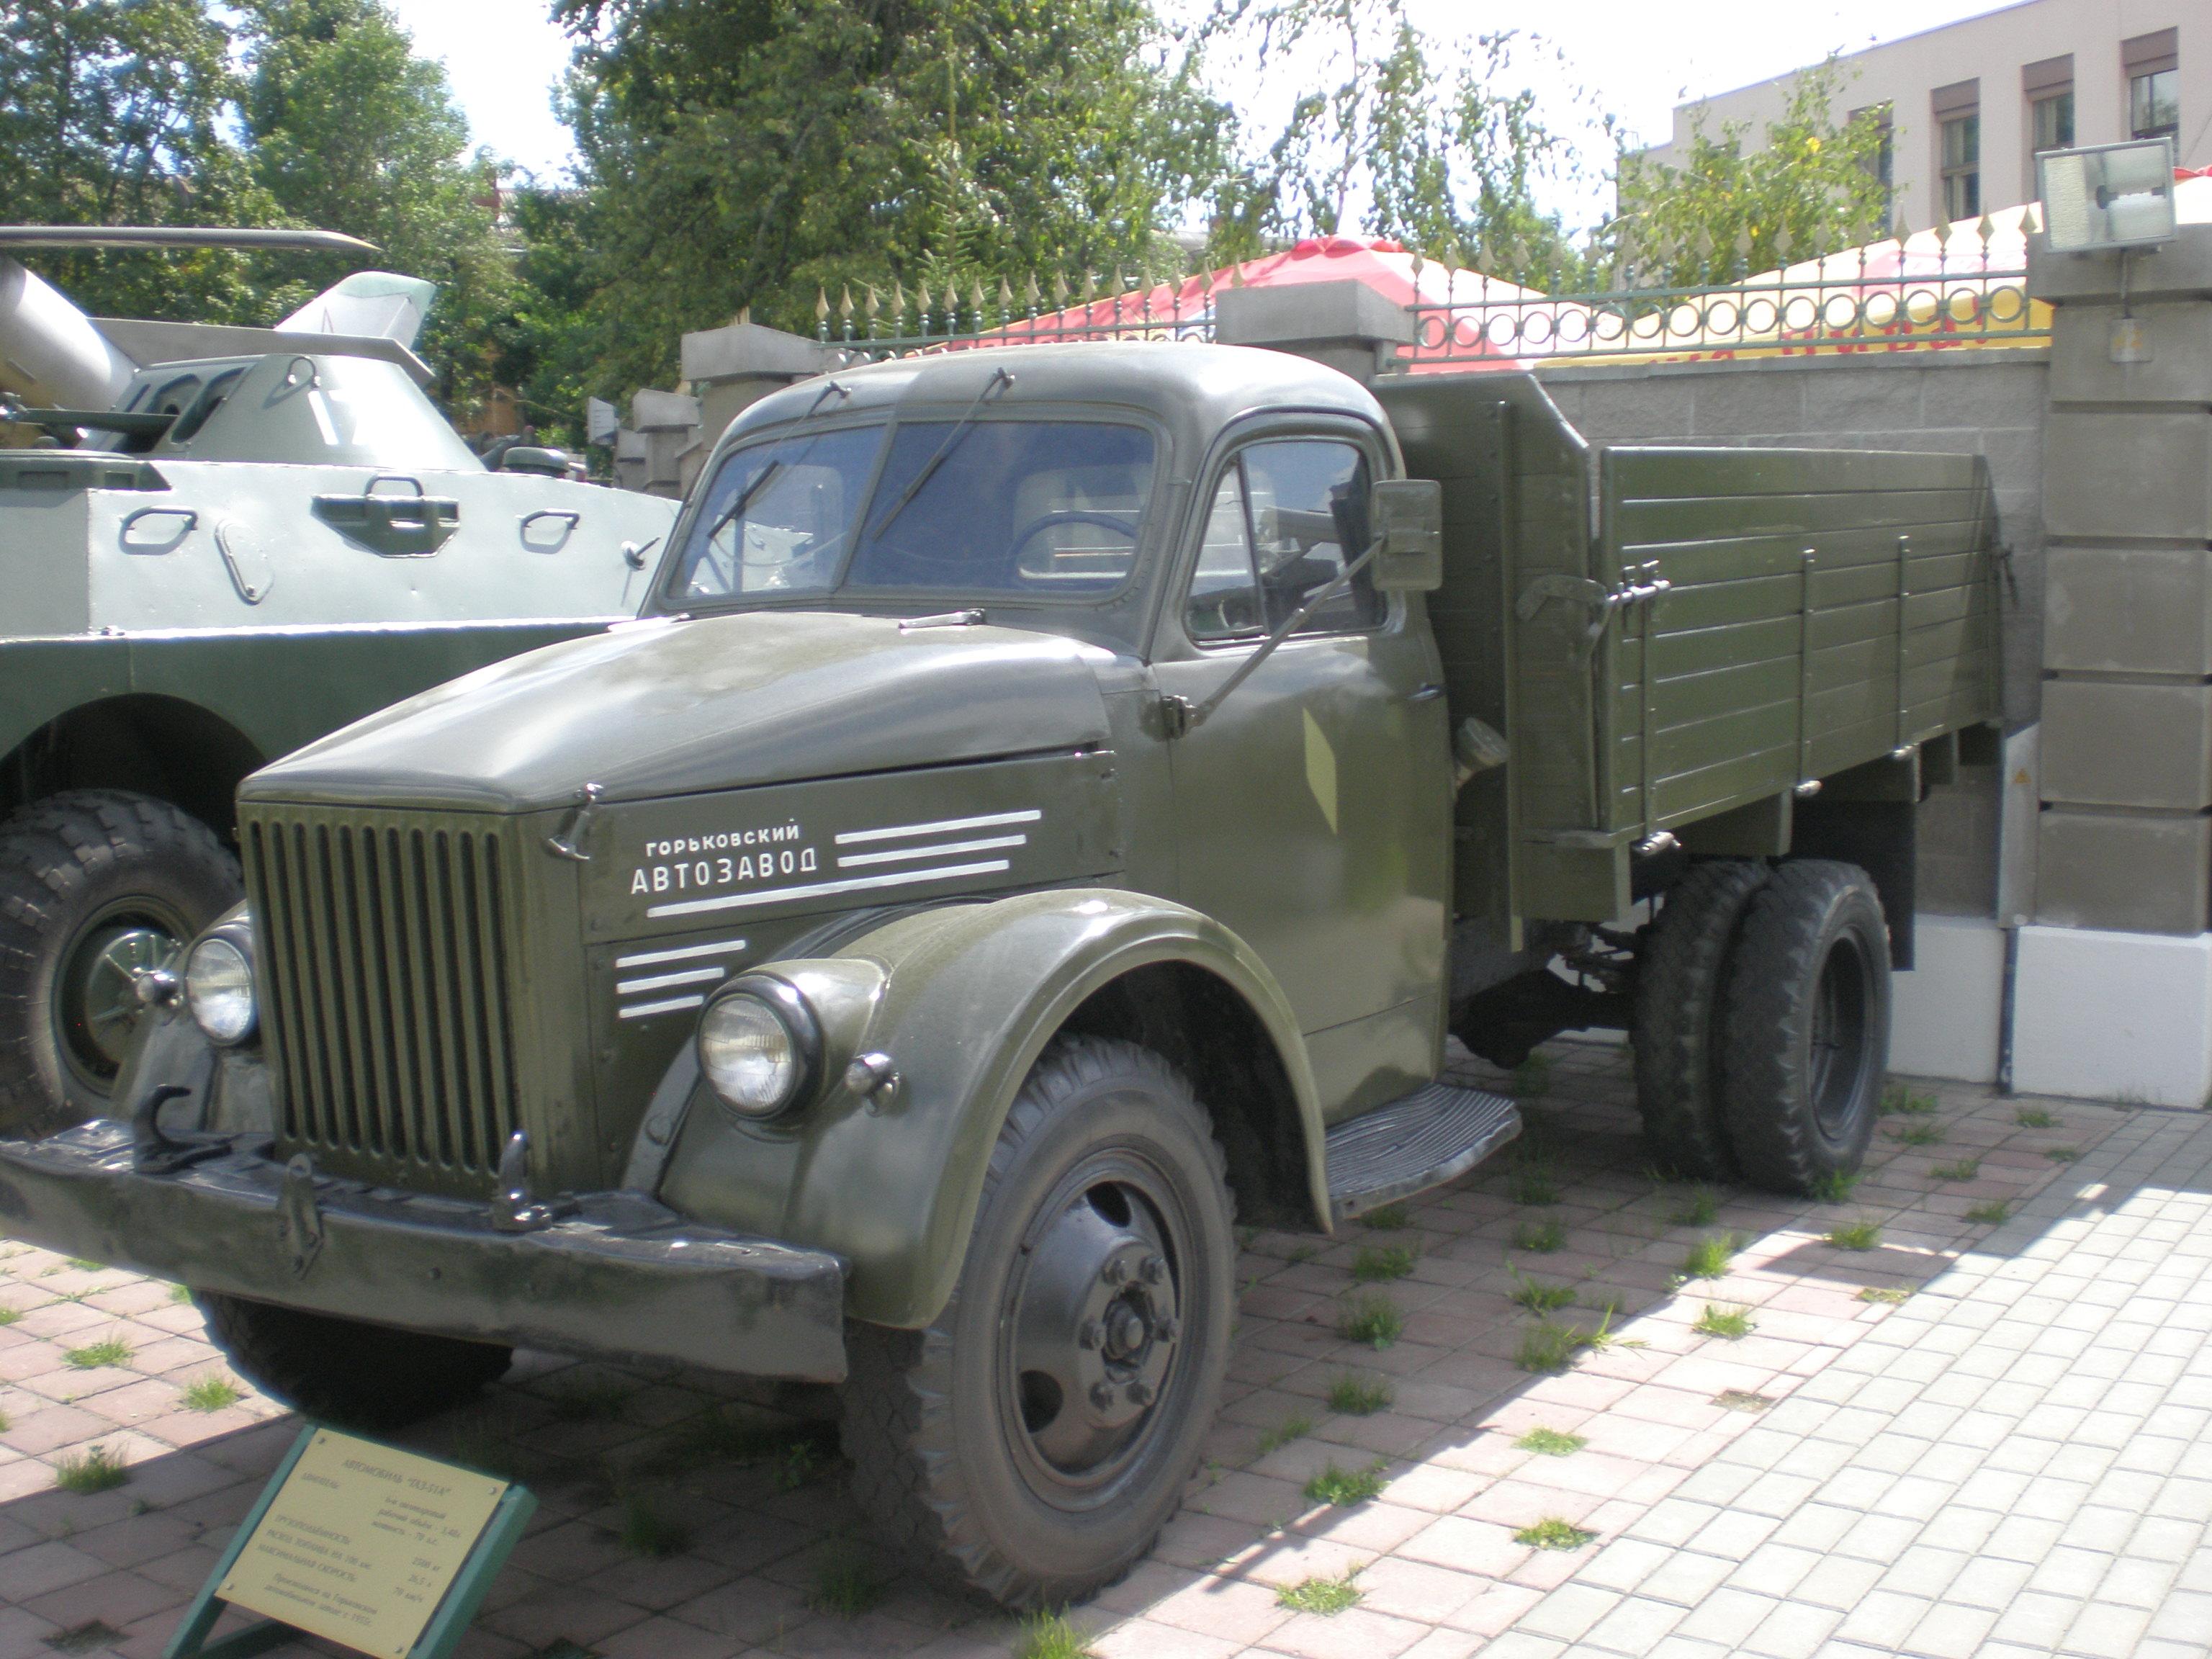 gaz-51_truck_in_a_military_museum_in_belarus.jpg